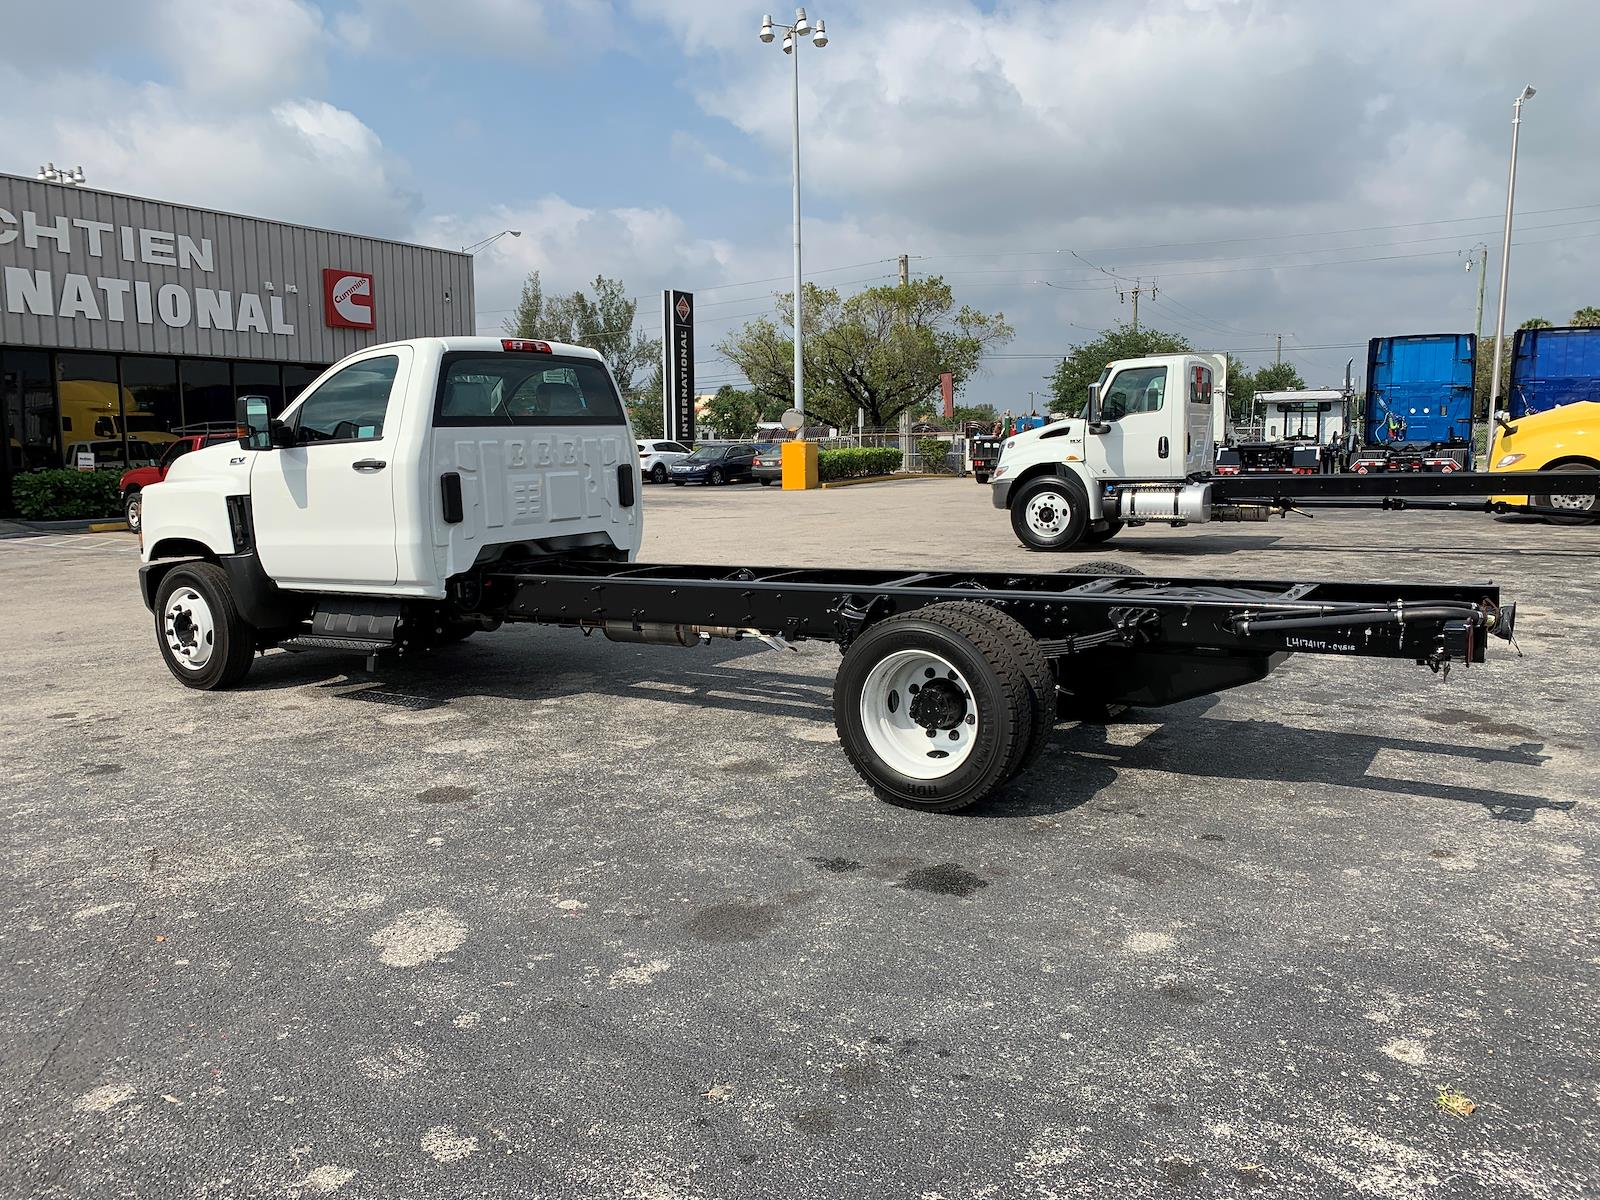 2022 International CV 4x4, Cab Chassis #PR-235451 - photo 1